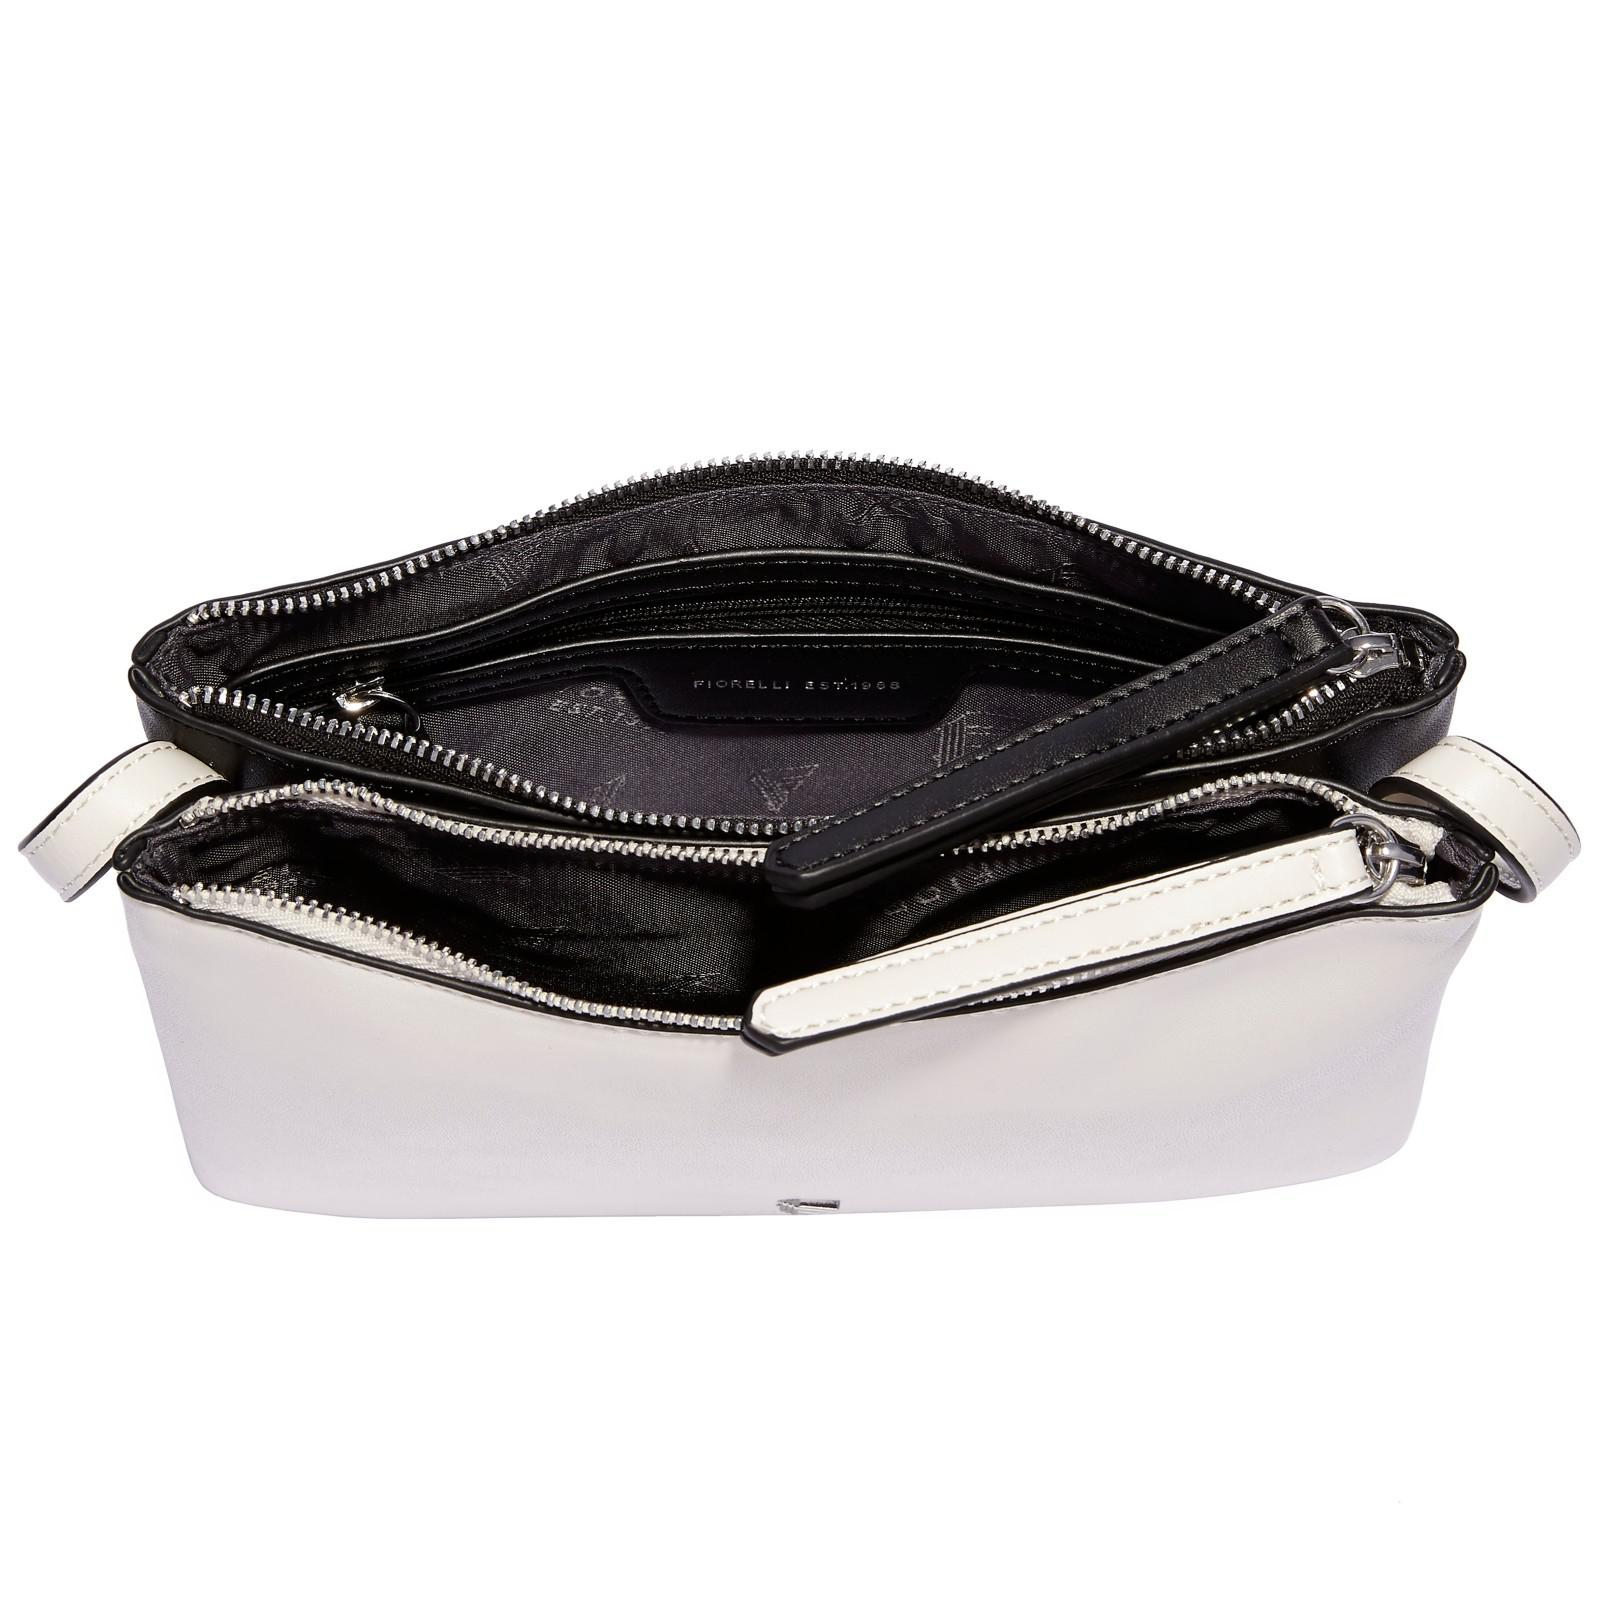 Fiorelli Synthetic Bunton Double Compartment Cross Body Bag